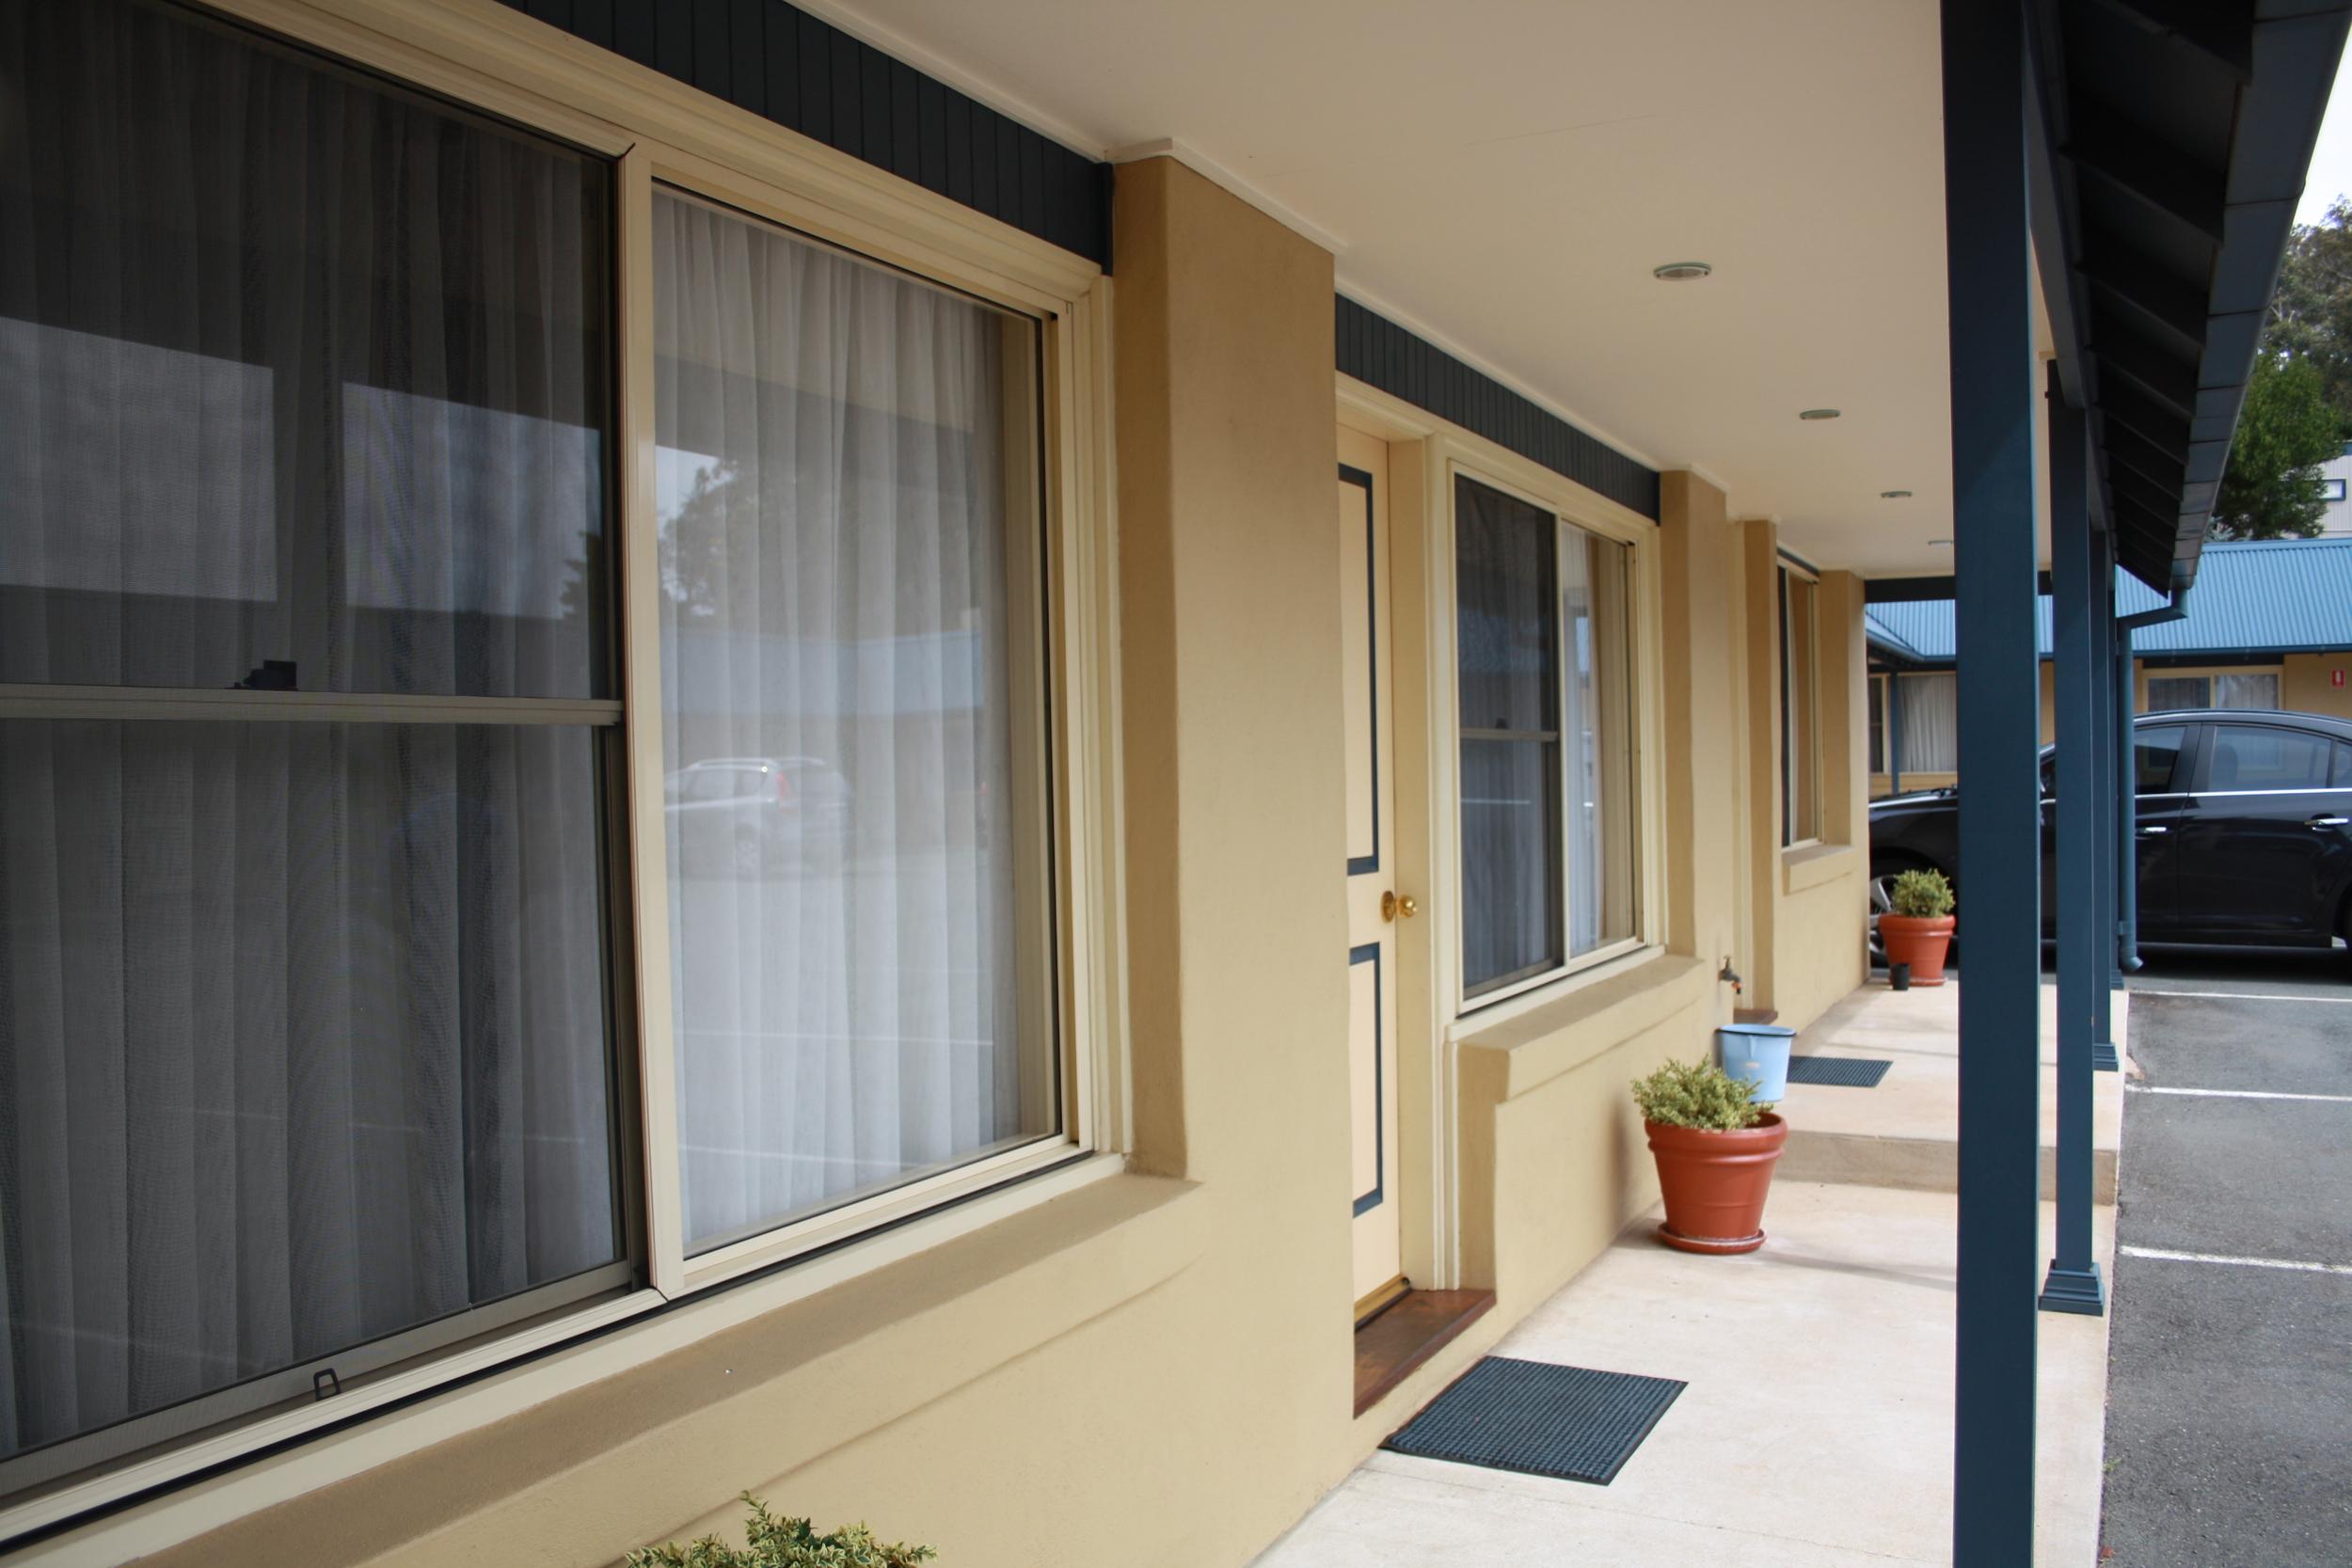 Andrew_Economos_Custom_Builder_Bowral_NSW_Australia_Country_Hotel_3.JPG